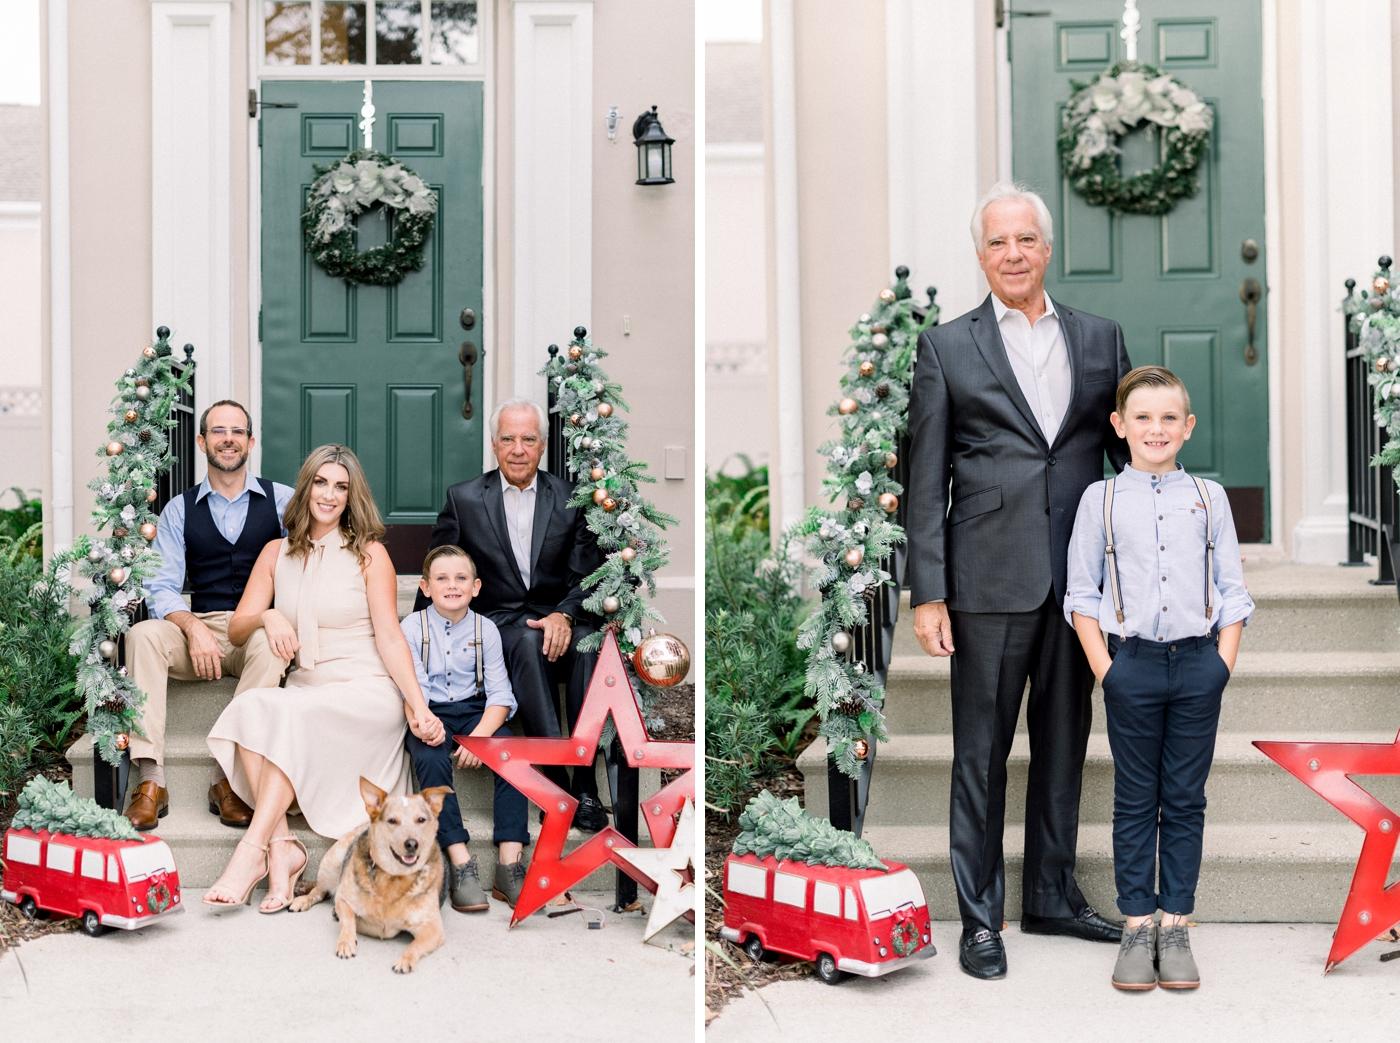 Orlando family portraits